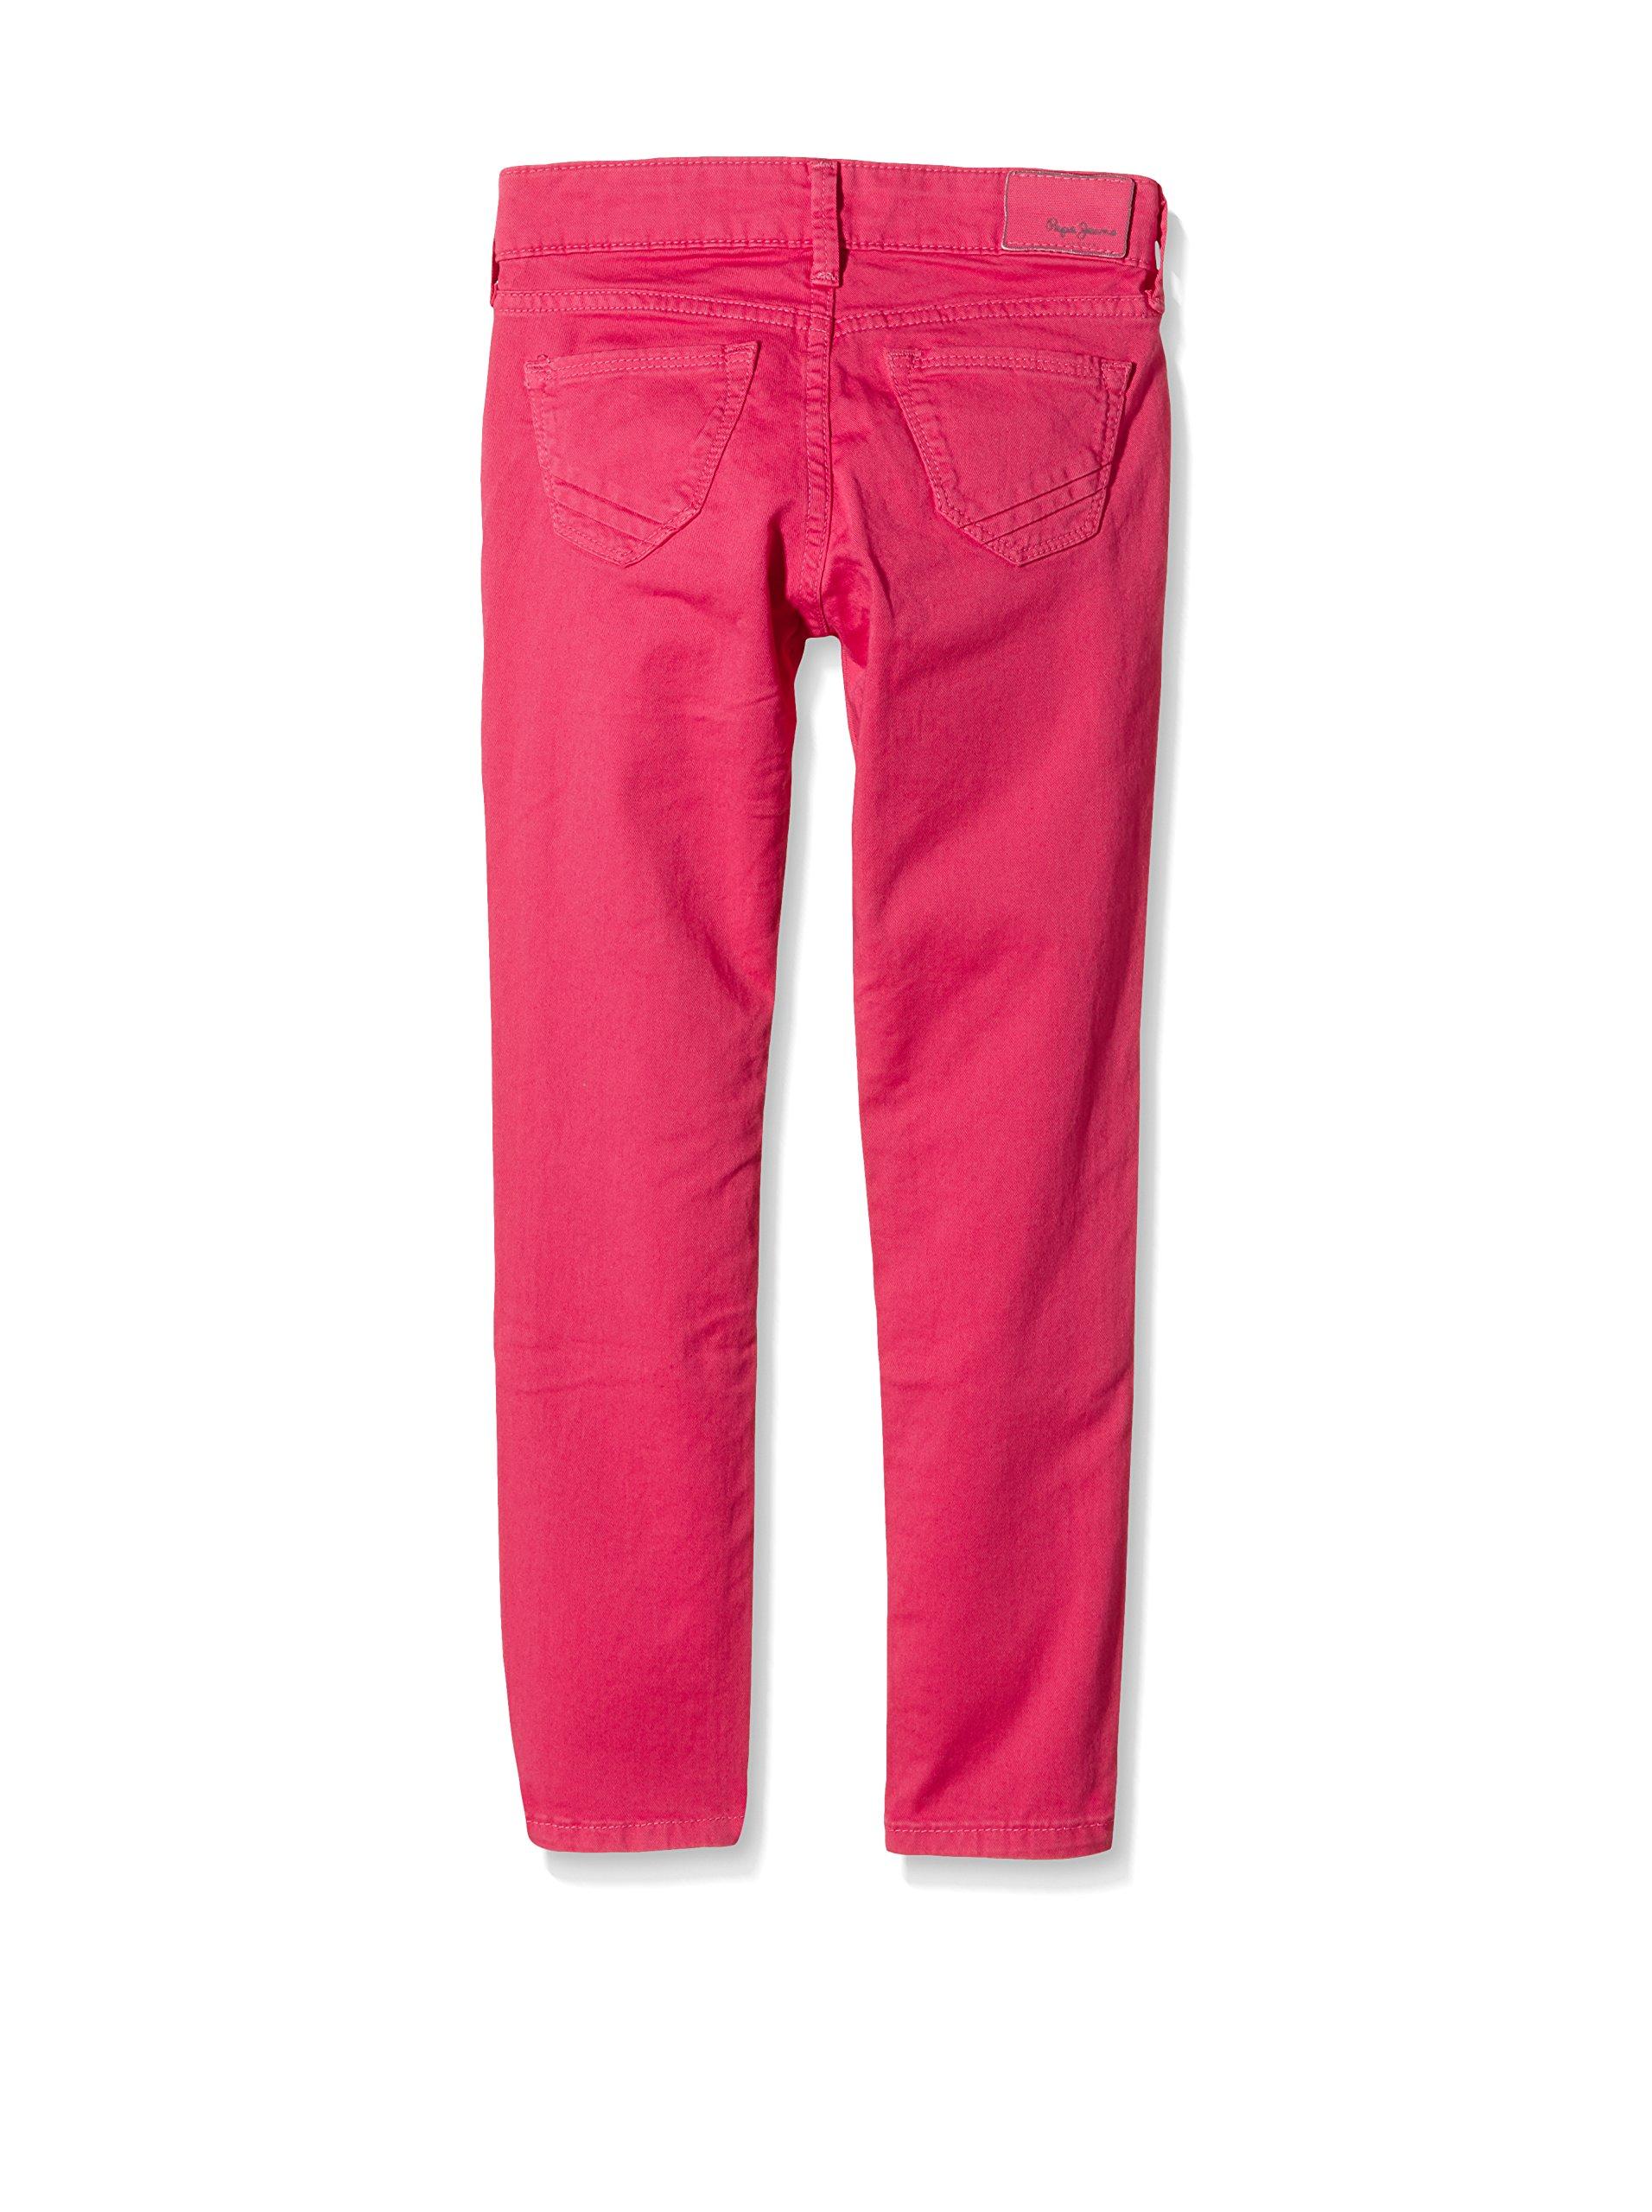 Pepe Jeans London Pantalón Pix Fucsia 2 años (92 cm)